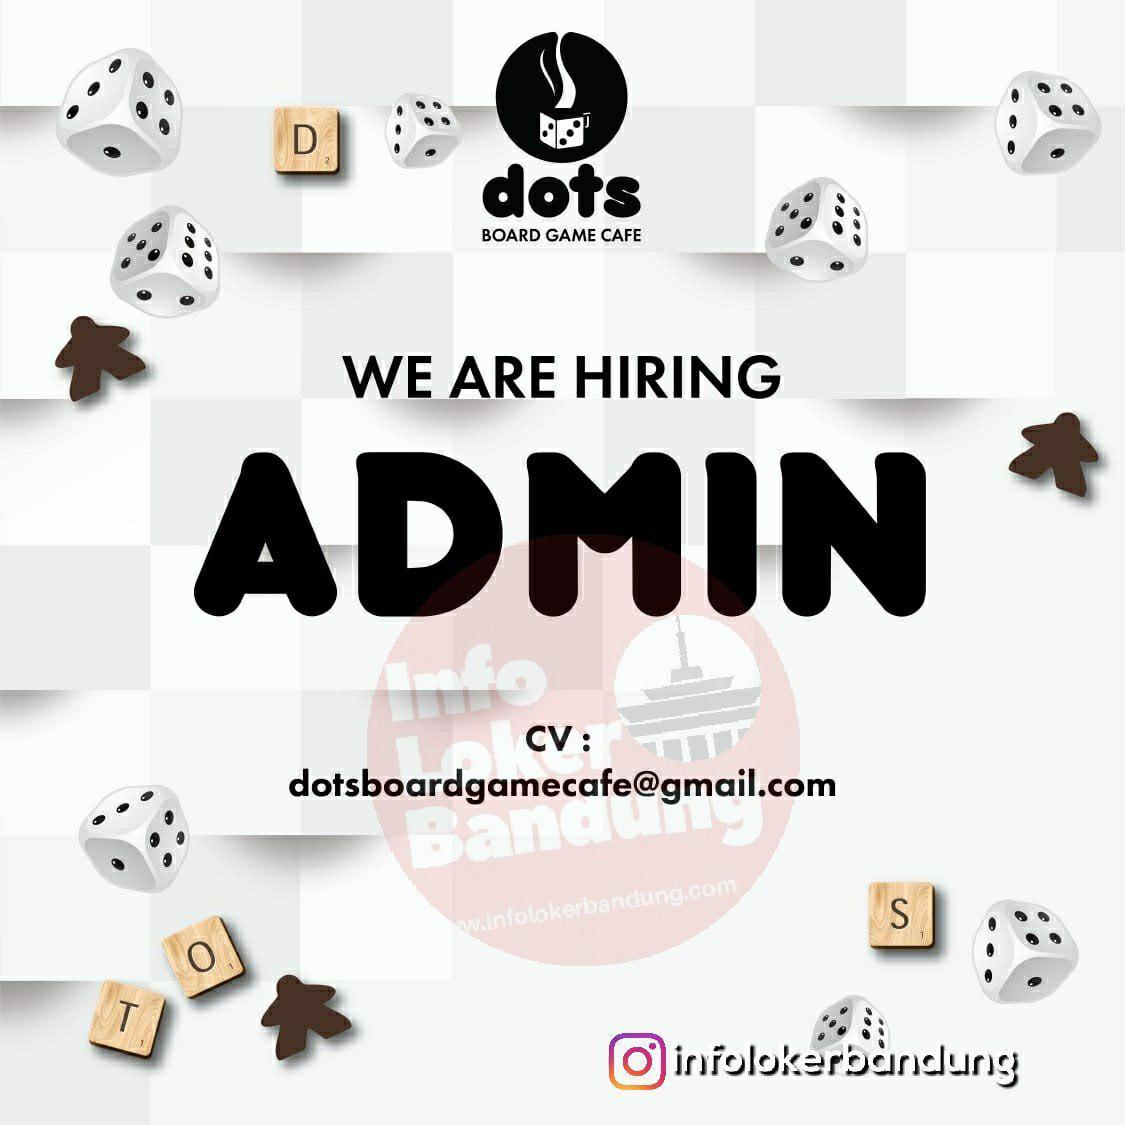 Lowongan Kerja Dots Board Game Cafe Bandung Januari 2019